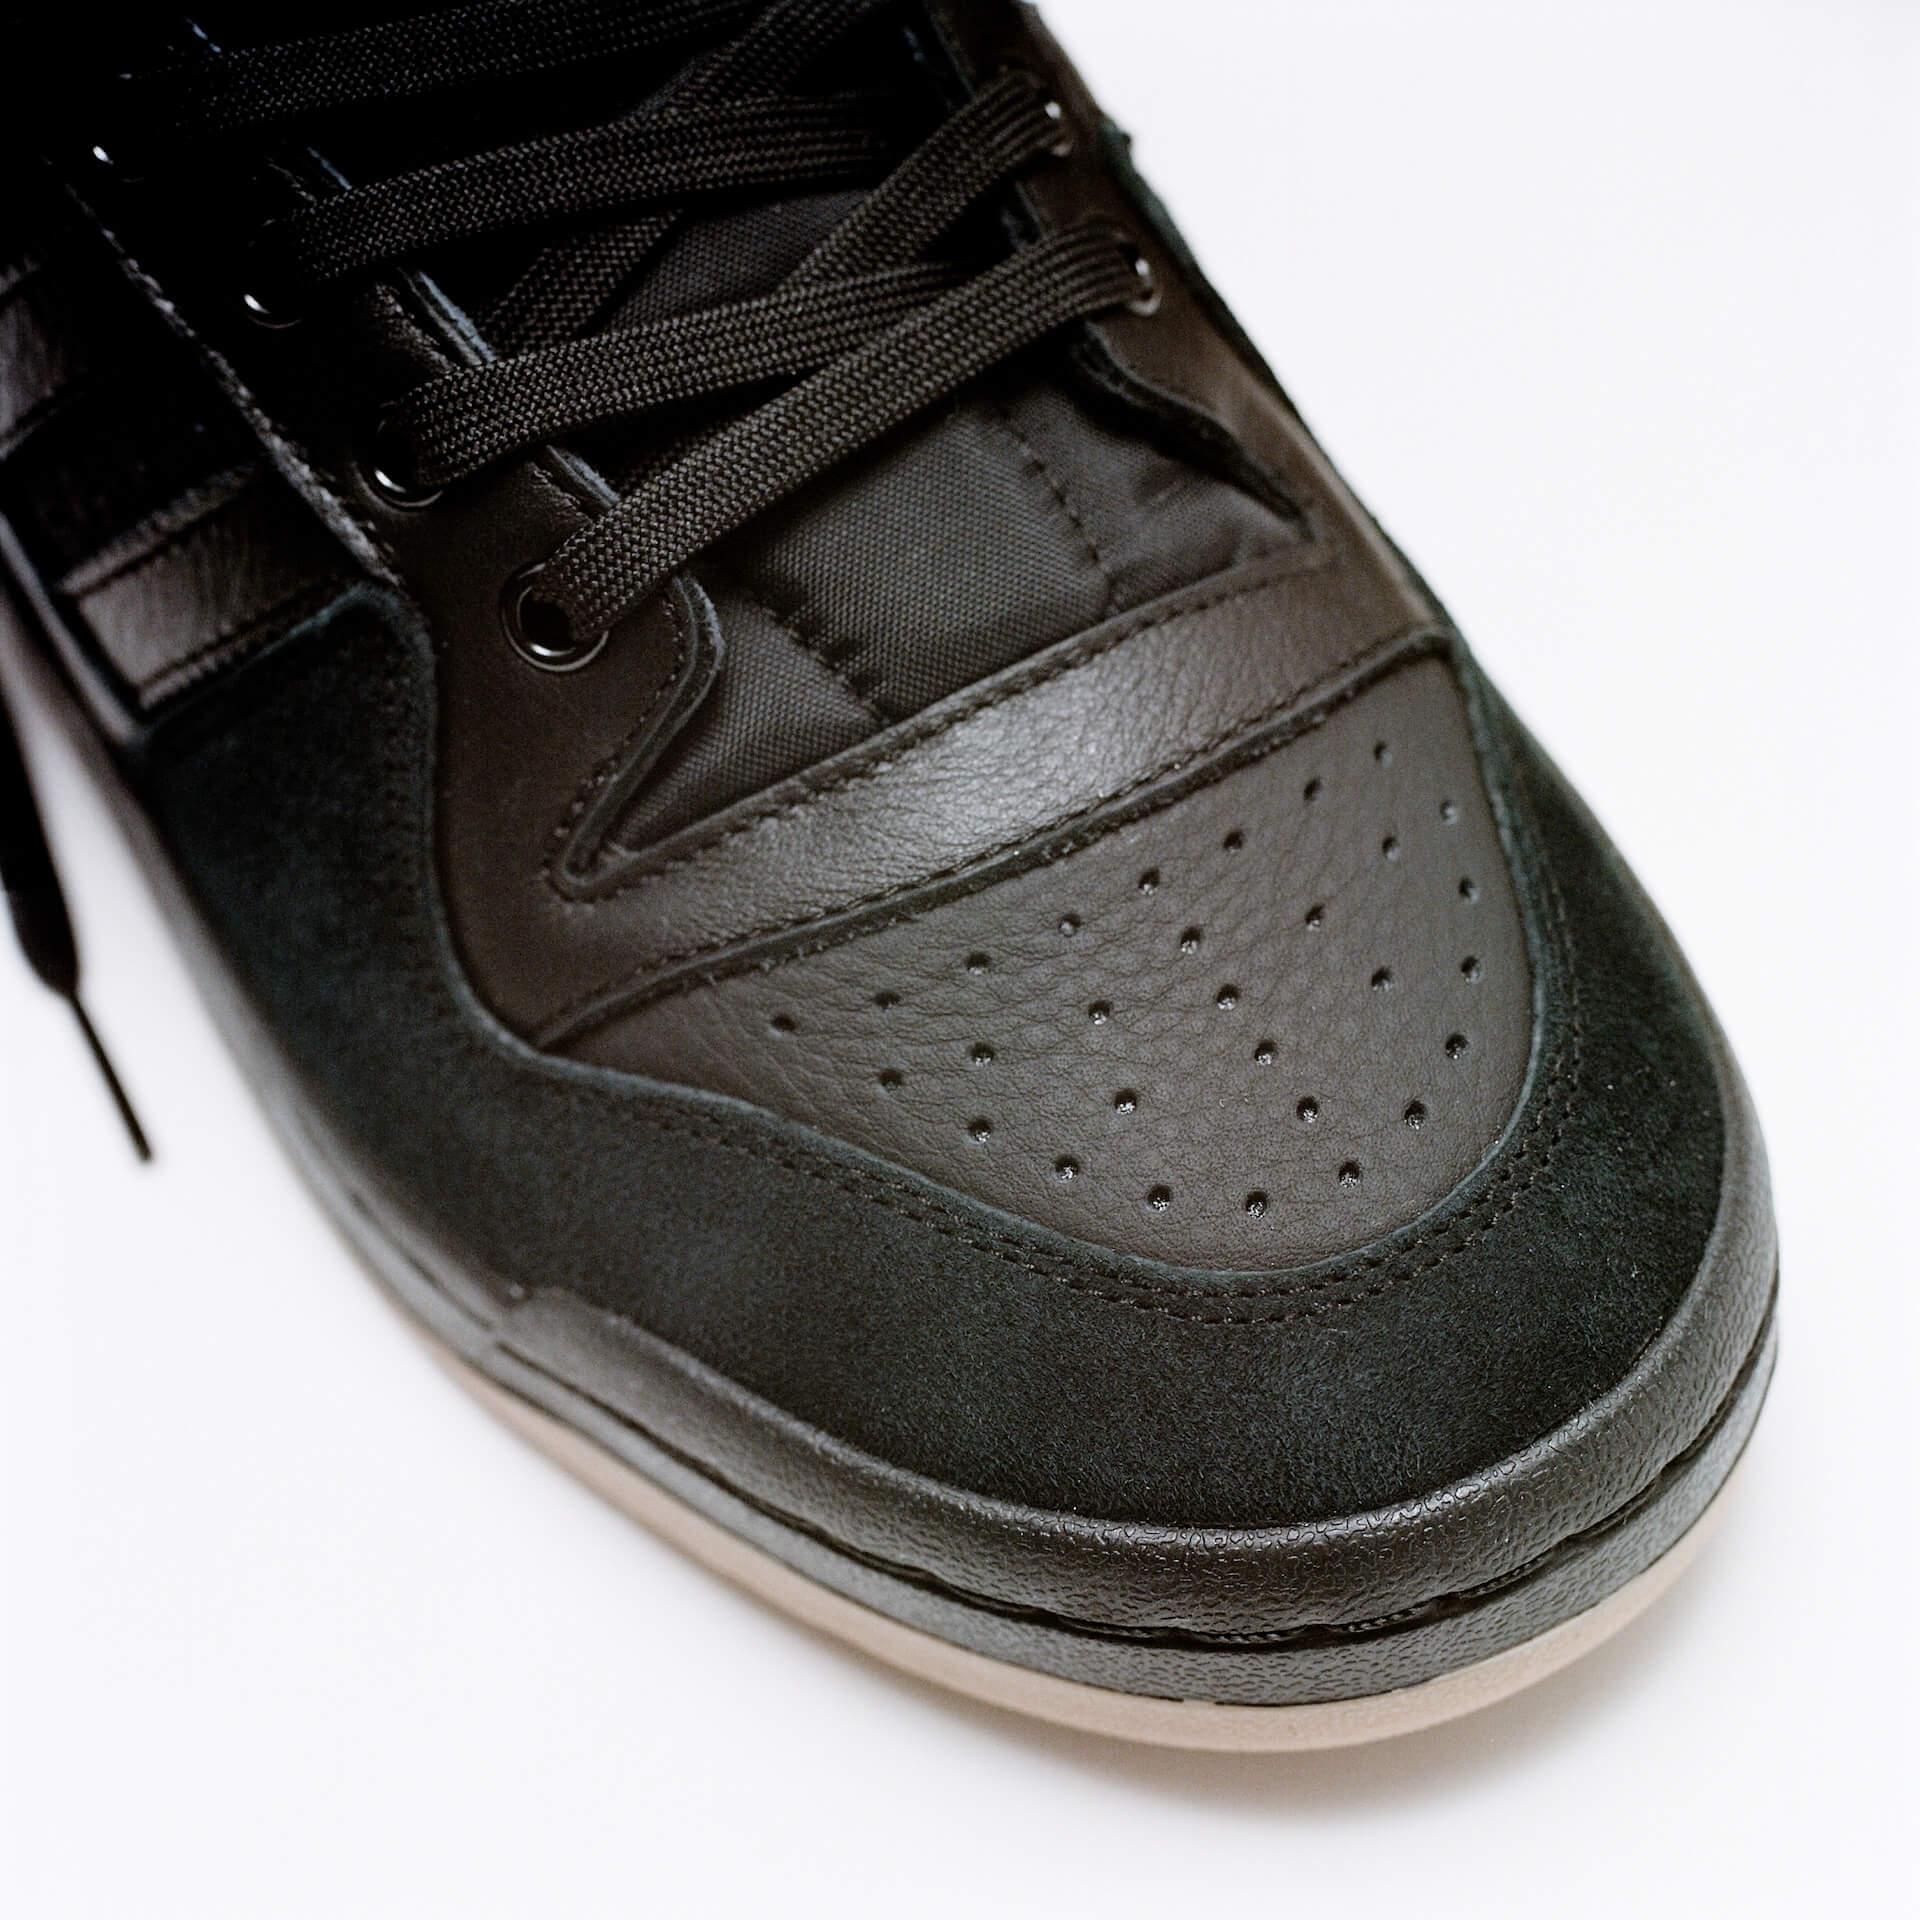 adidas Skateboarding「FORUM 84 ADV」に春夏仕様の新色が登場!チョークホワイト&ブラックの2色 life210324_adidasskateboarding_2